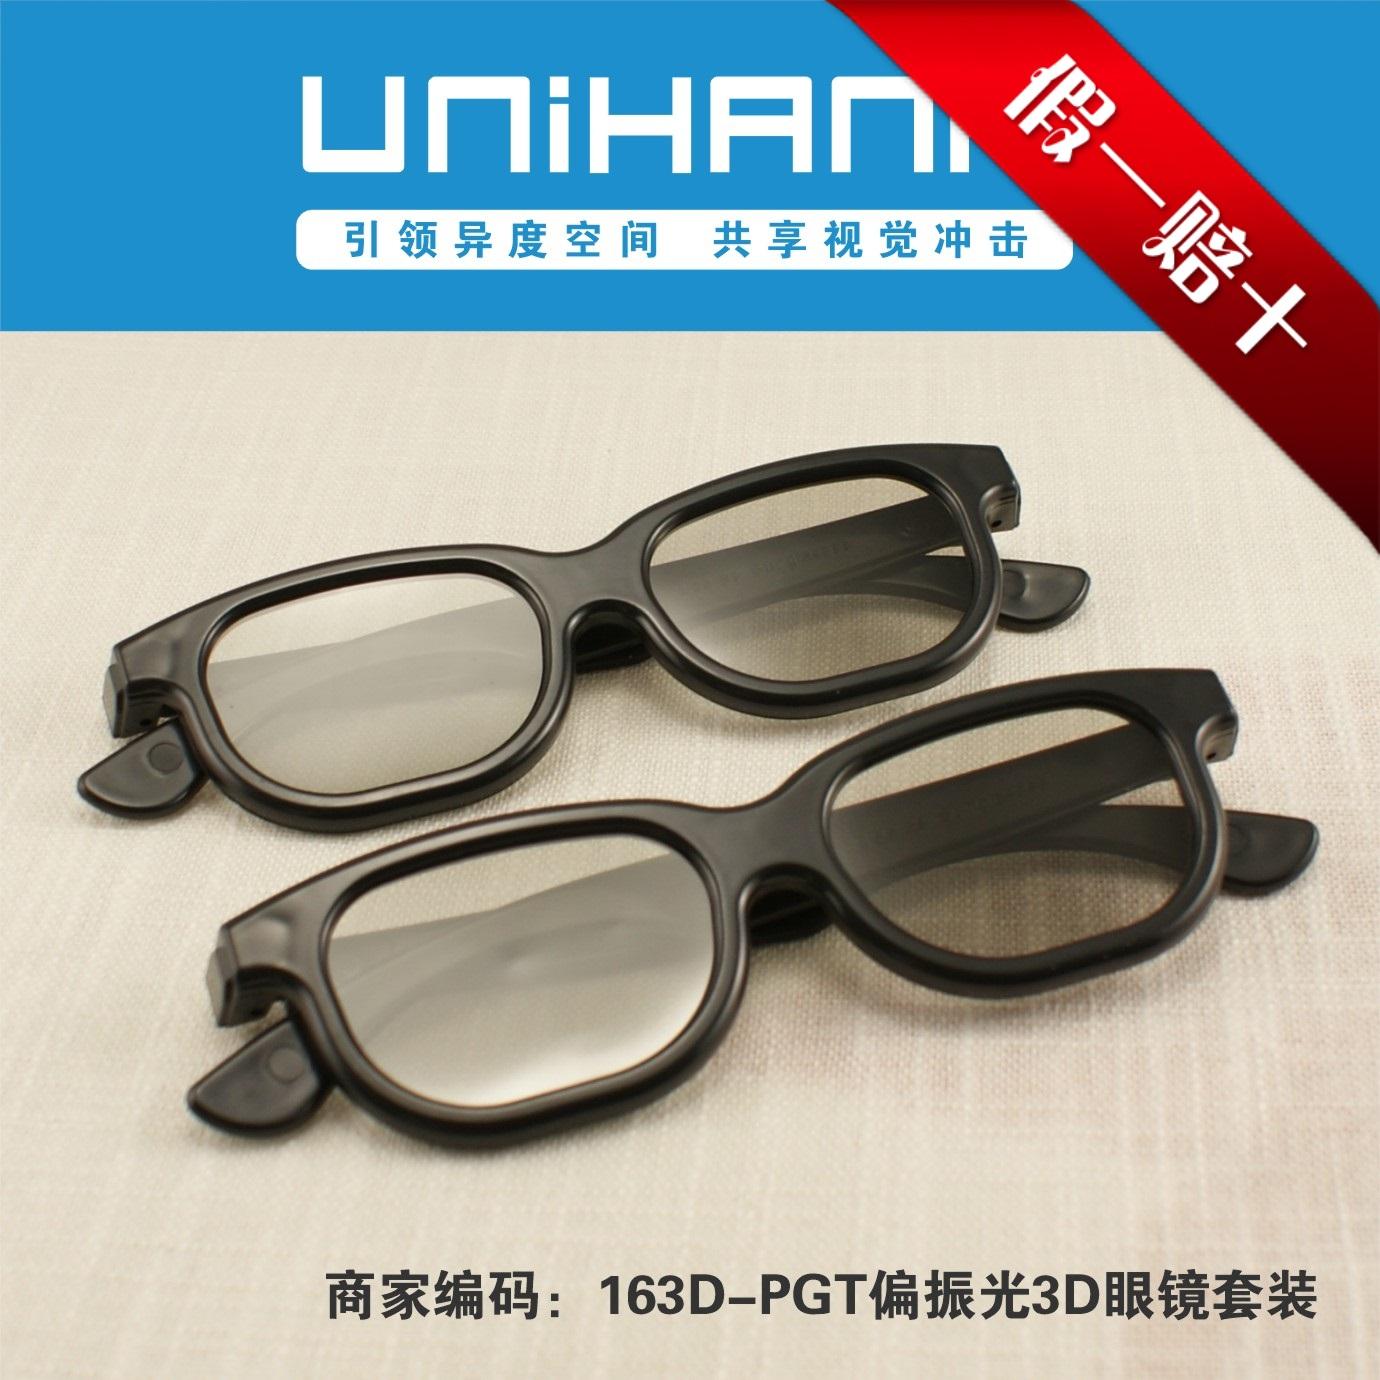 Set imax reald glasses polarized 3d display 3d(China (Mainland))